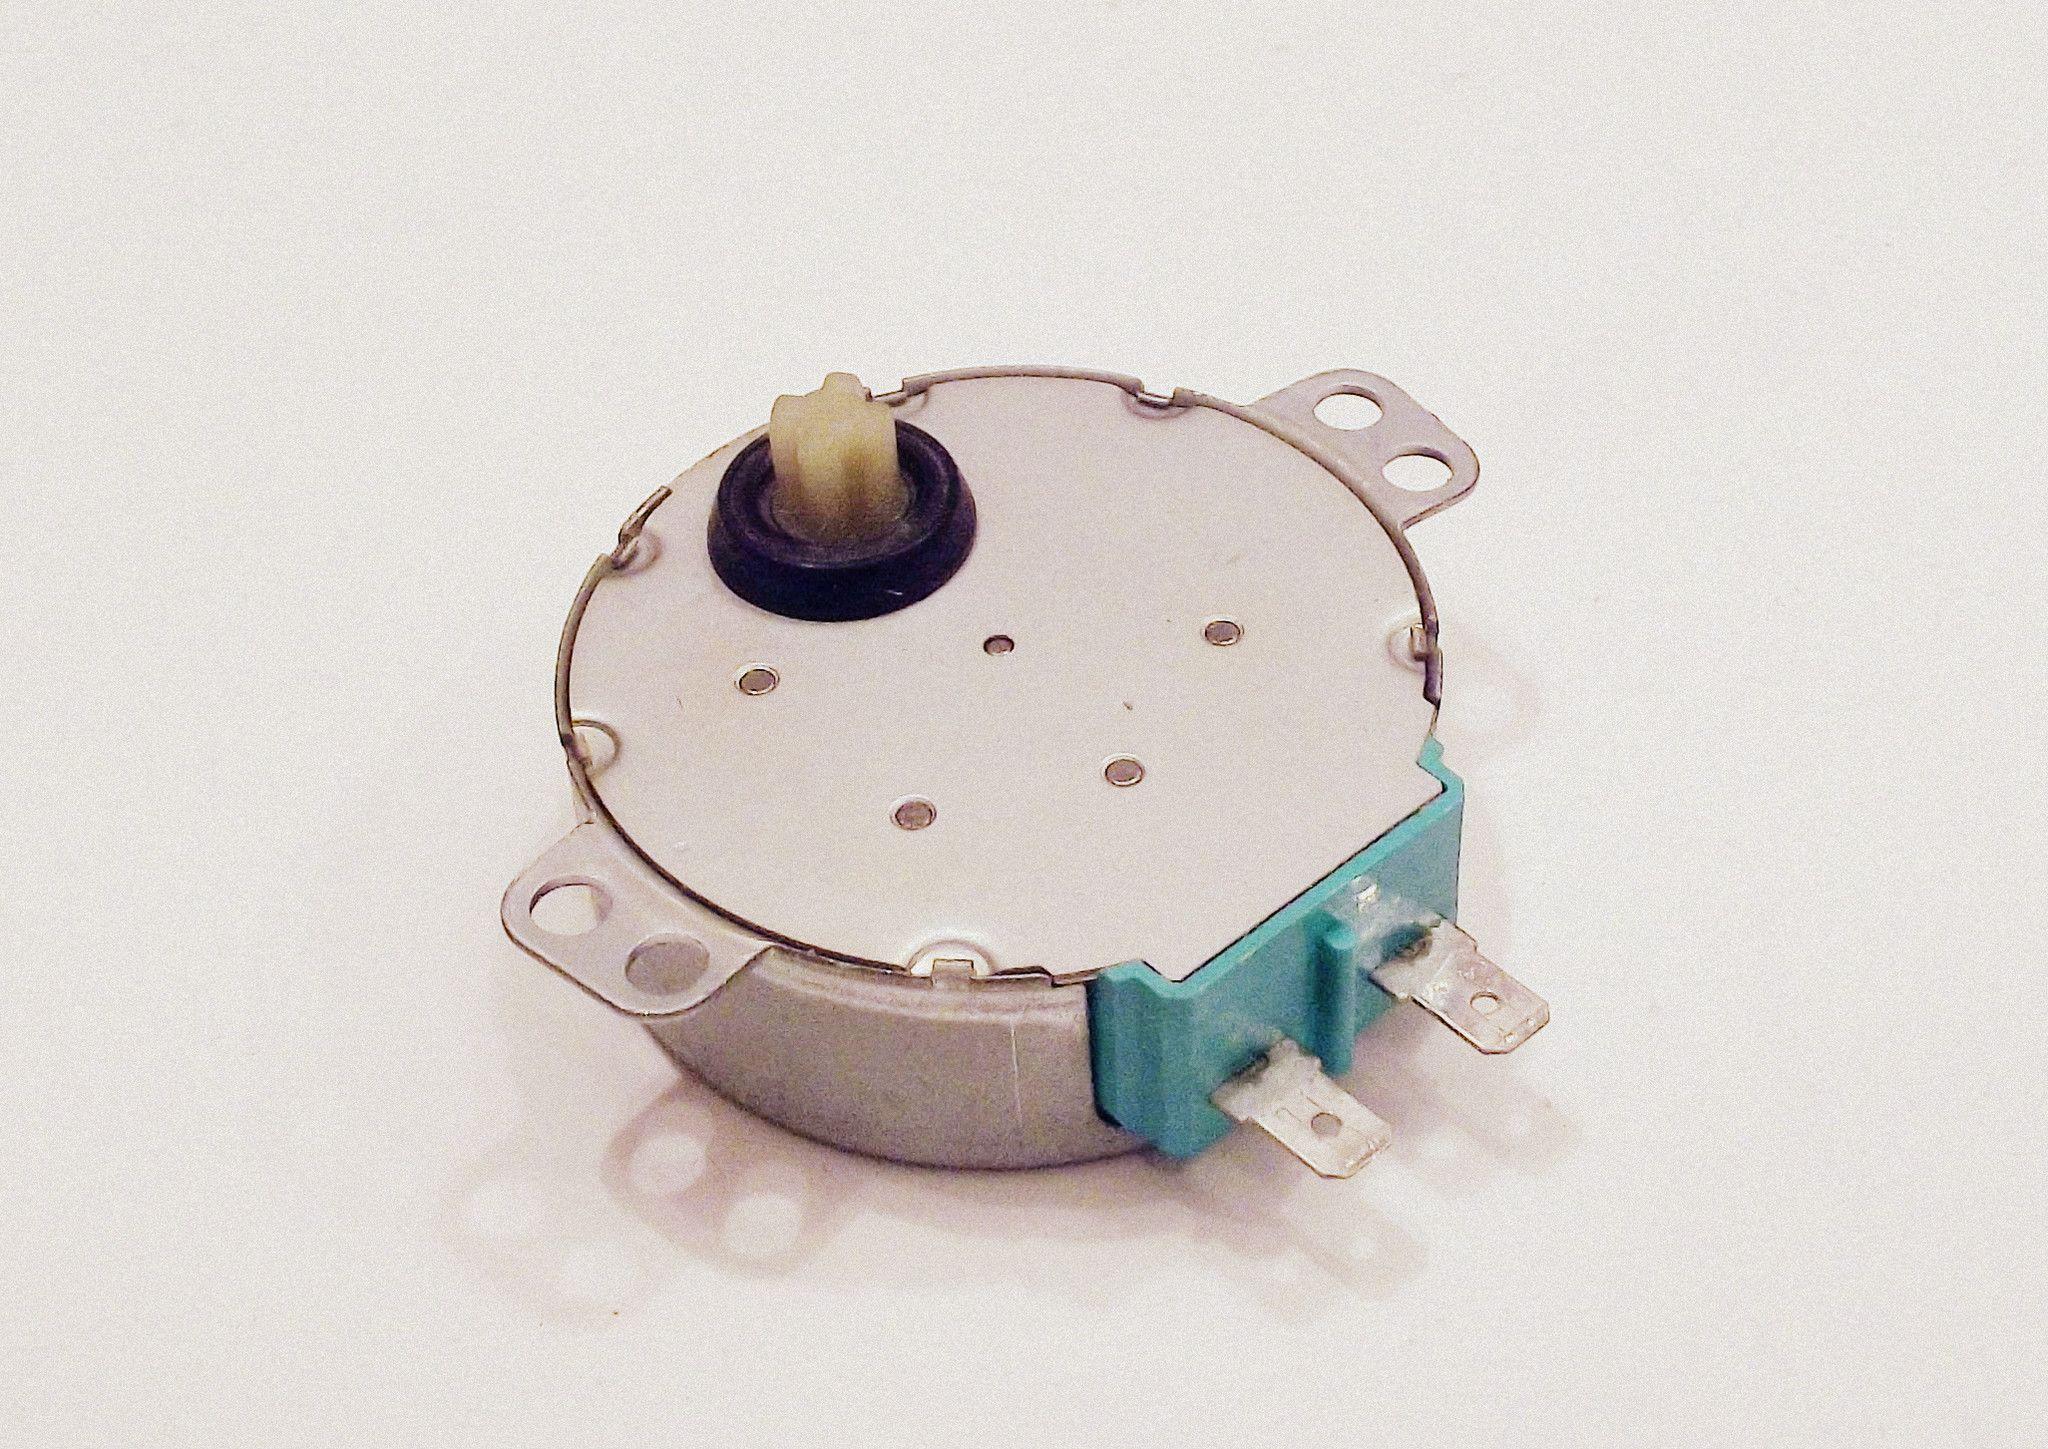 RMOTDA186WRE0 Sharp Microwave Turntable Motor